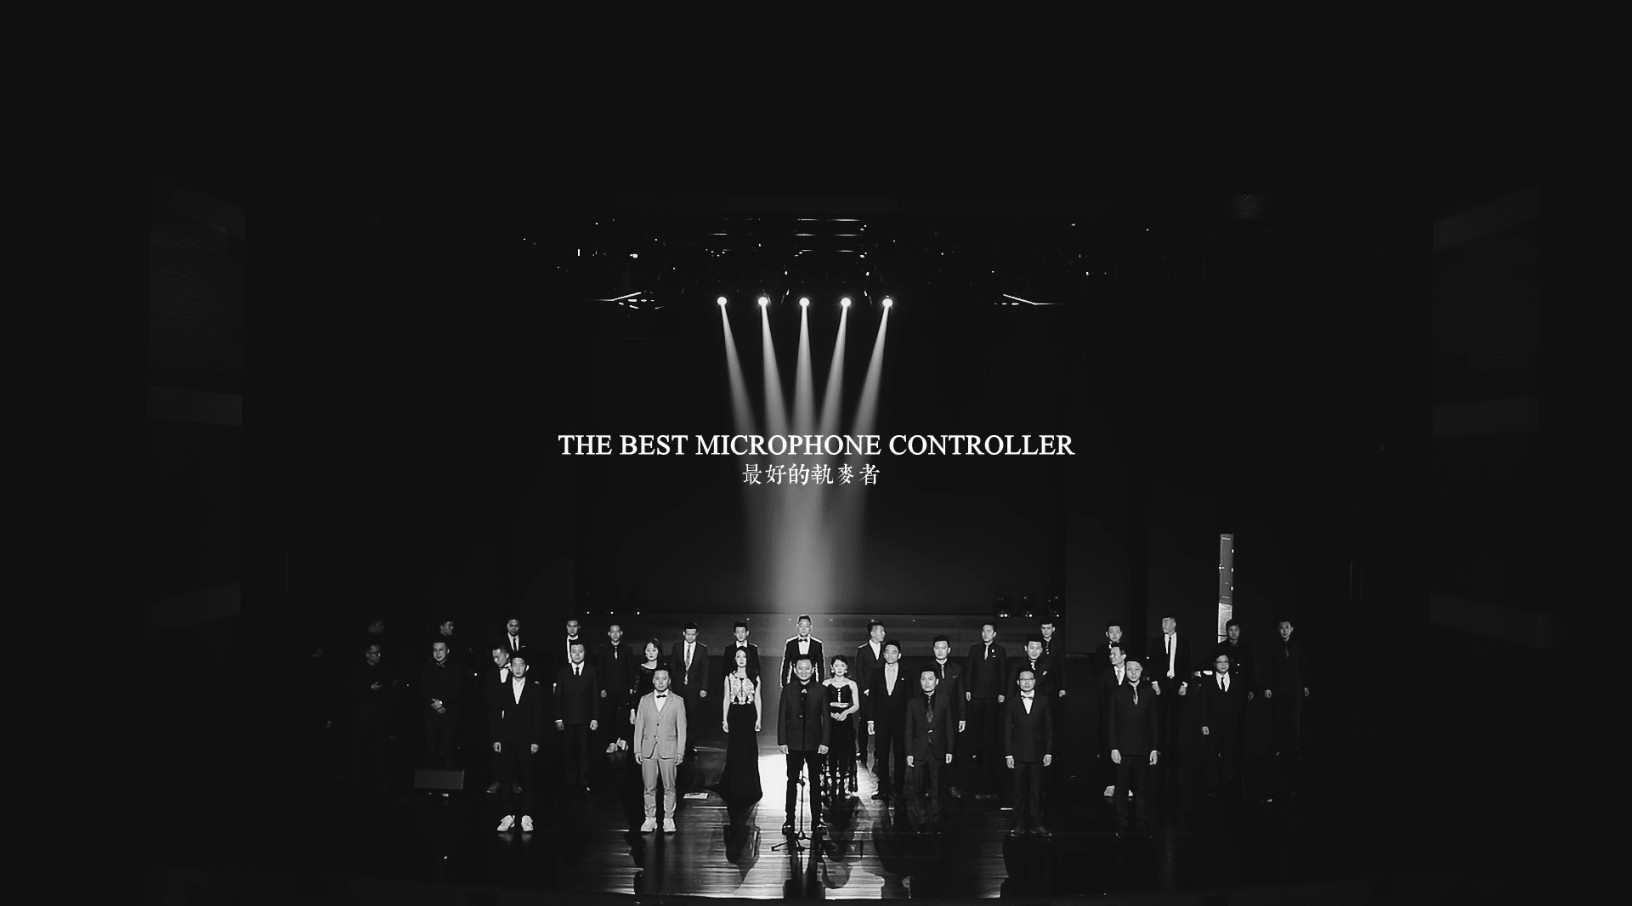 Sumo素陌幻象- [THE BEST MICROPHONE CONTROLLER ]B.M.C.